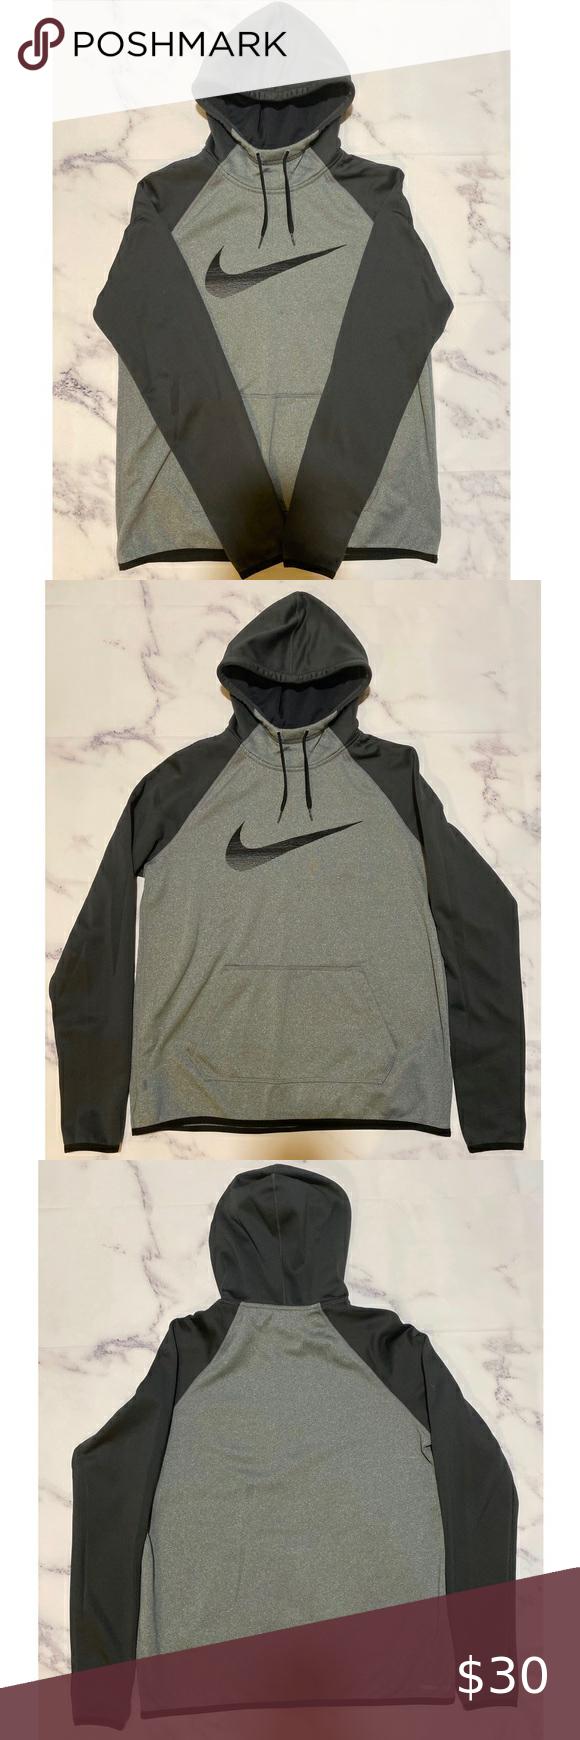 Predownload: Nike Therma Fit Sweatshirt Workout Sweatshirt Sweatshirts Grey Hooded Sweatshirt [ 1740 x 580 Pixel ]